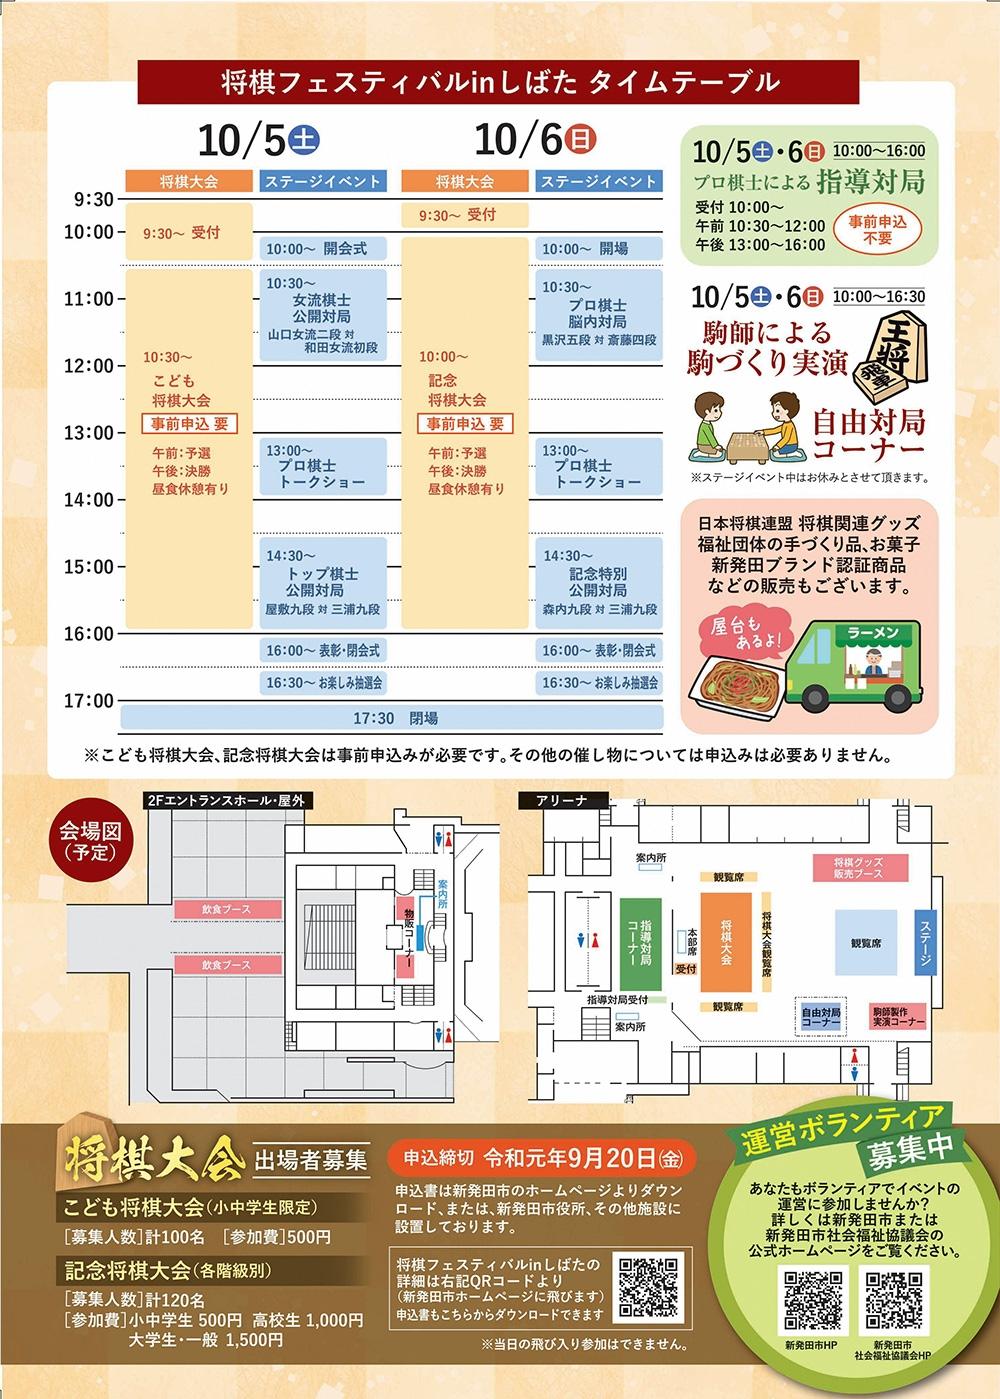 https://www.shogi.or.jp/event/34nationalshogifes-2.jpg